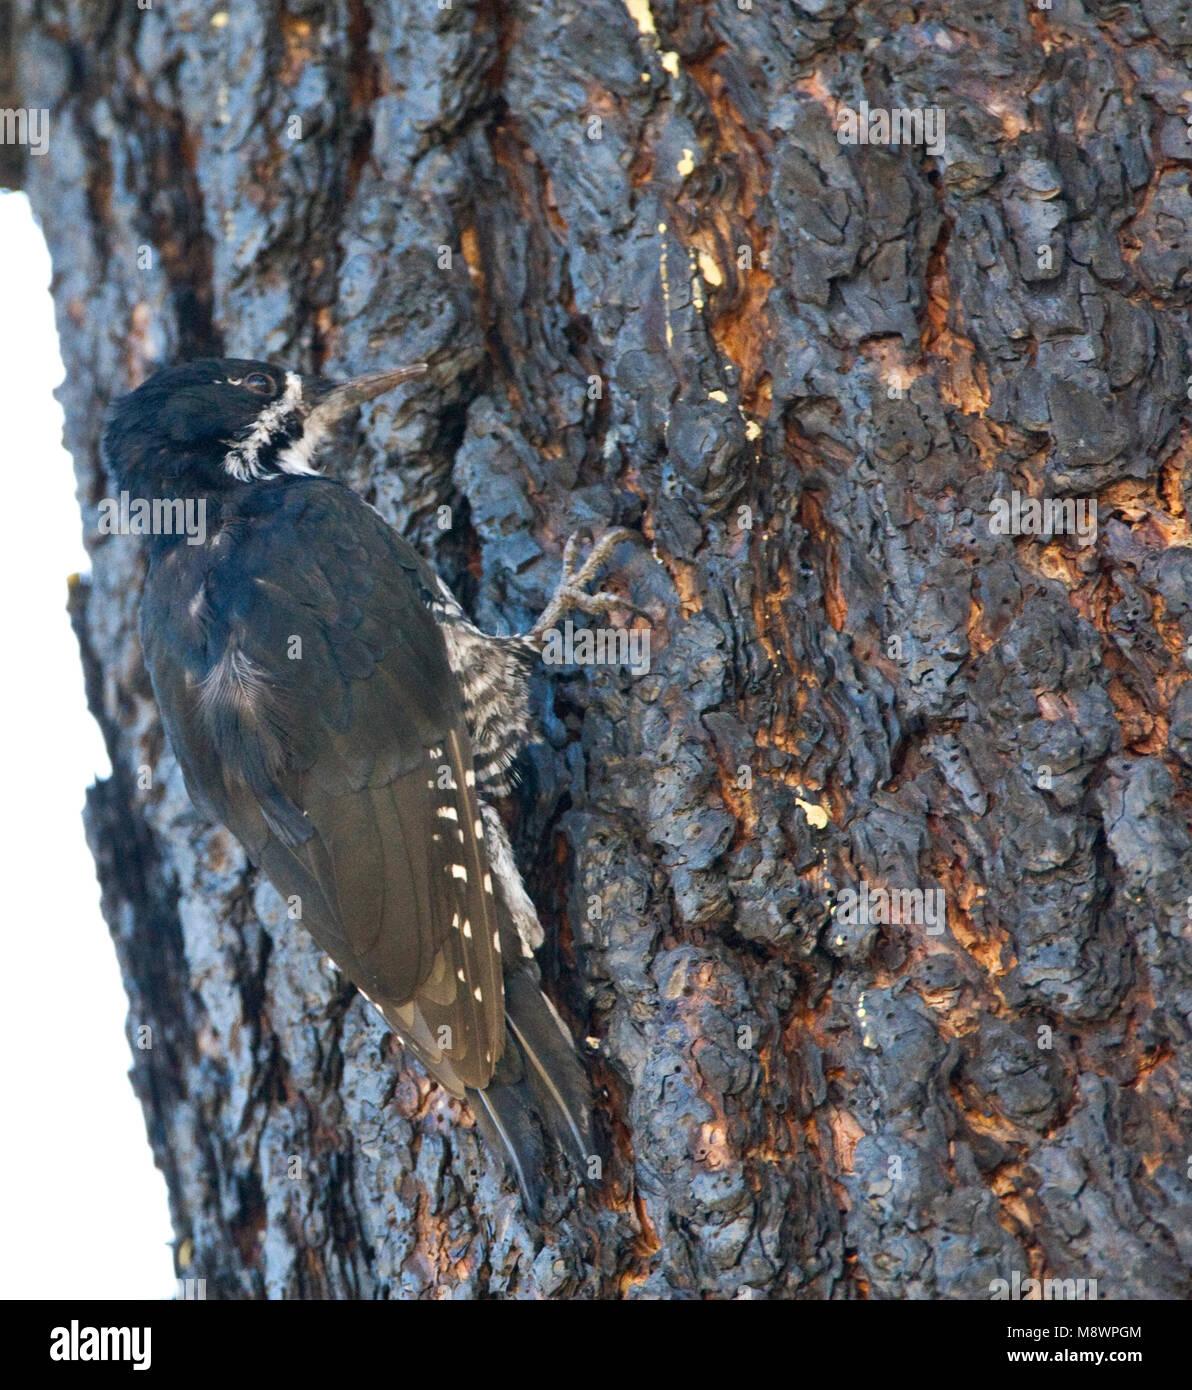 Zwartrugspecht, Black-backed Woodpecker - Stock Image